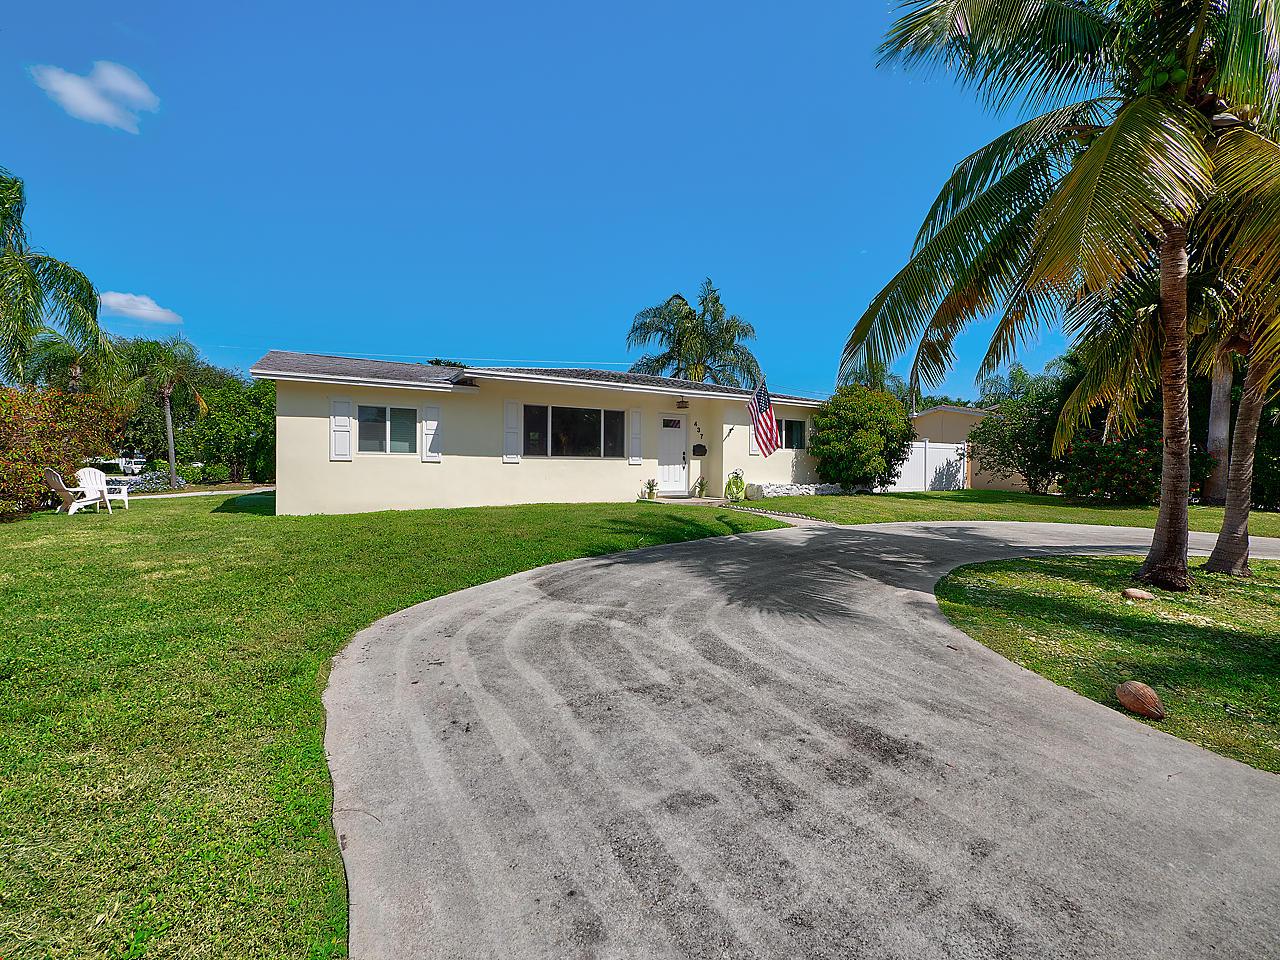 Photo of 437 Driftwood Road, North Palm Beach, FL 33408